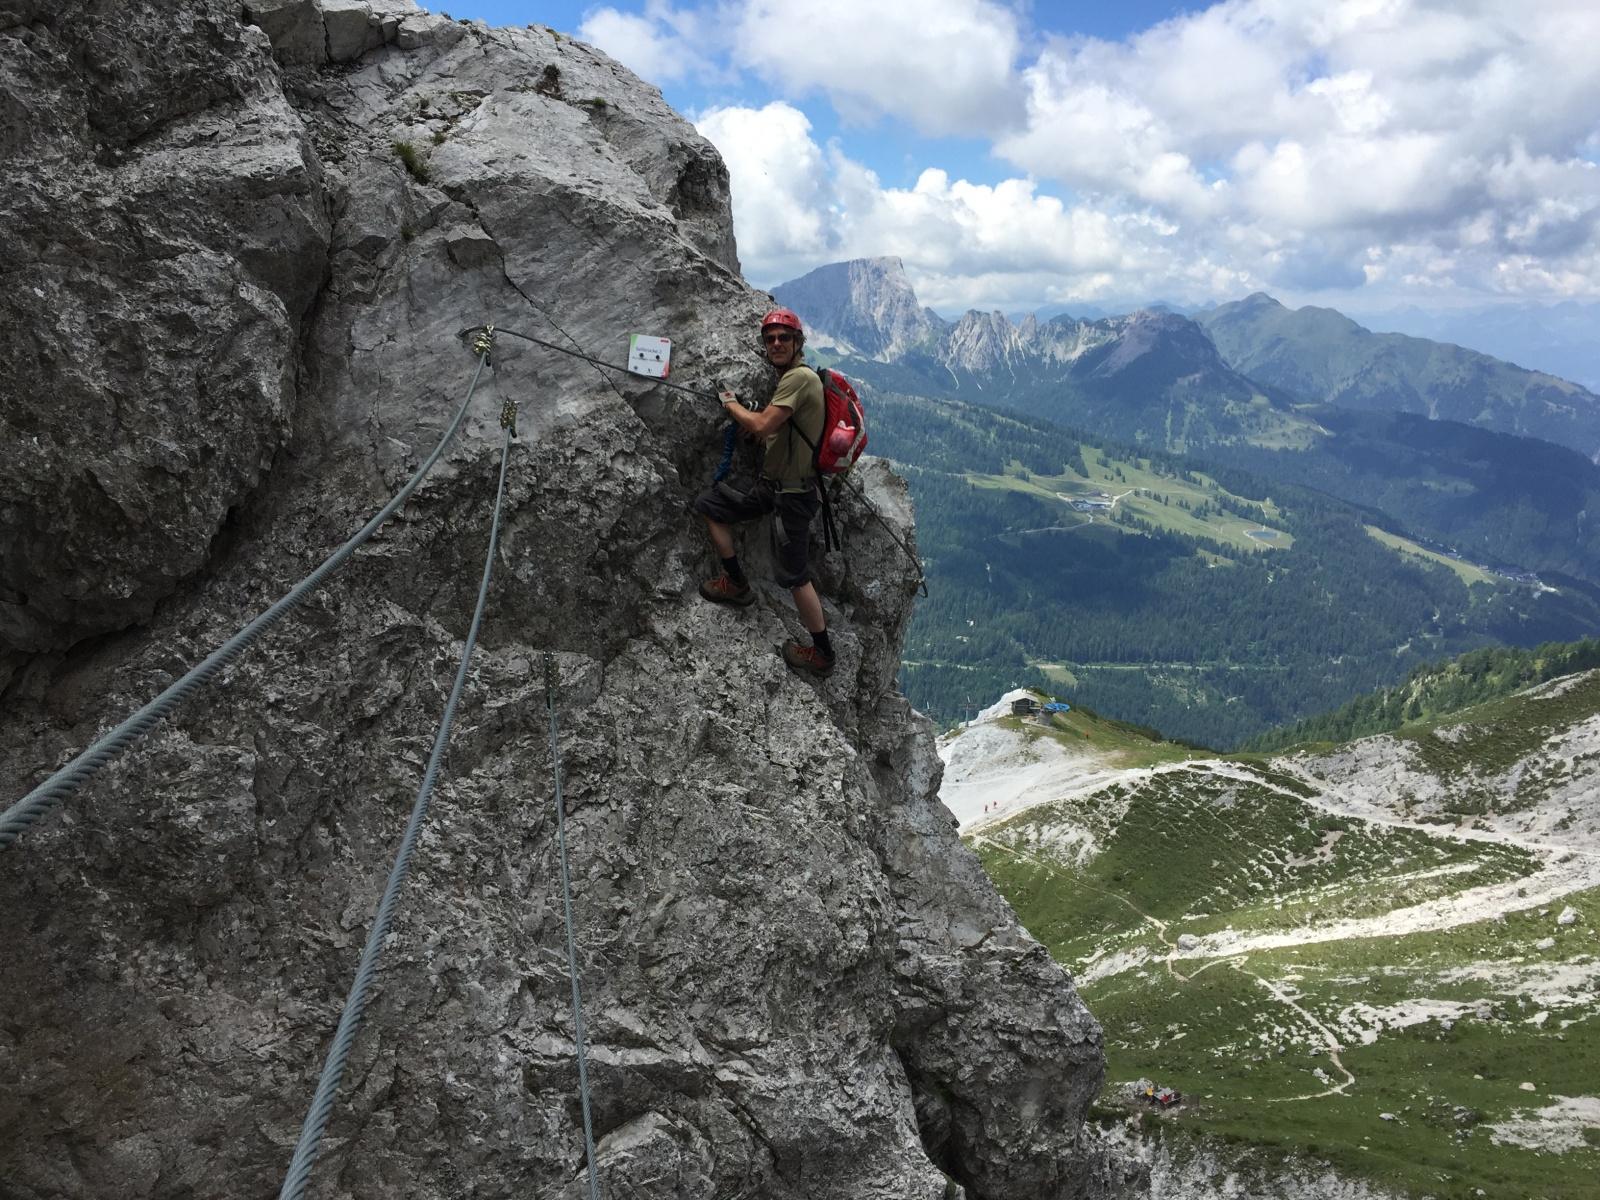 Klettersteig Däumling : Der däumling klettersteig am nassfeldpaß abenteuer blog